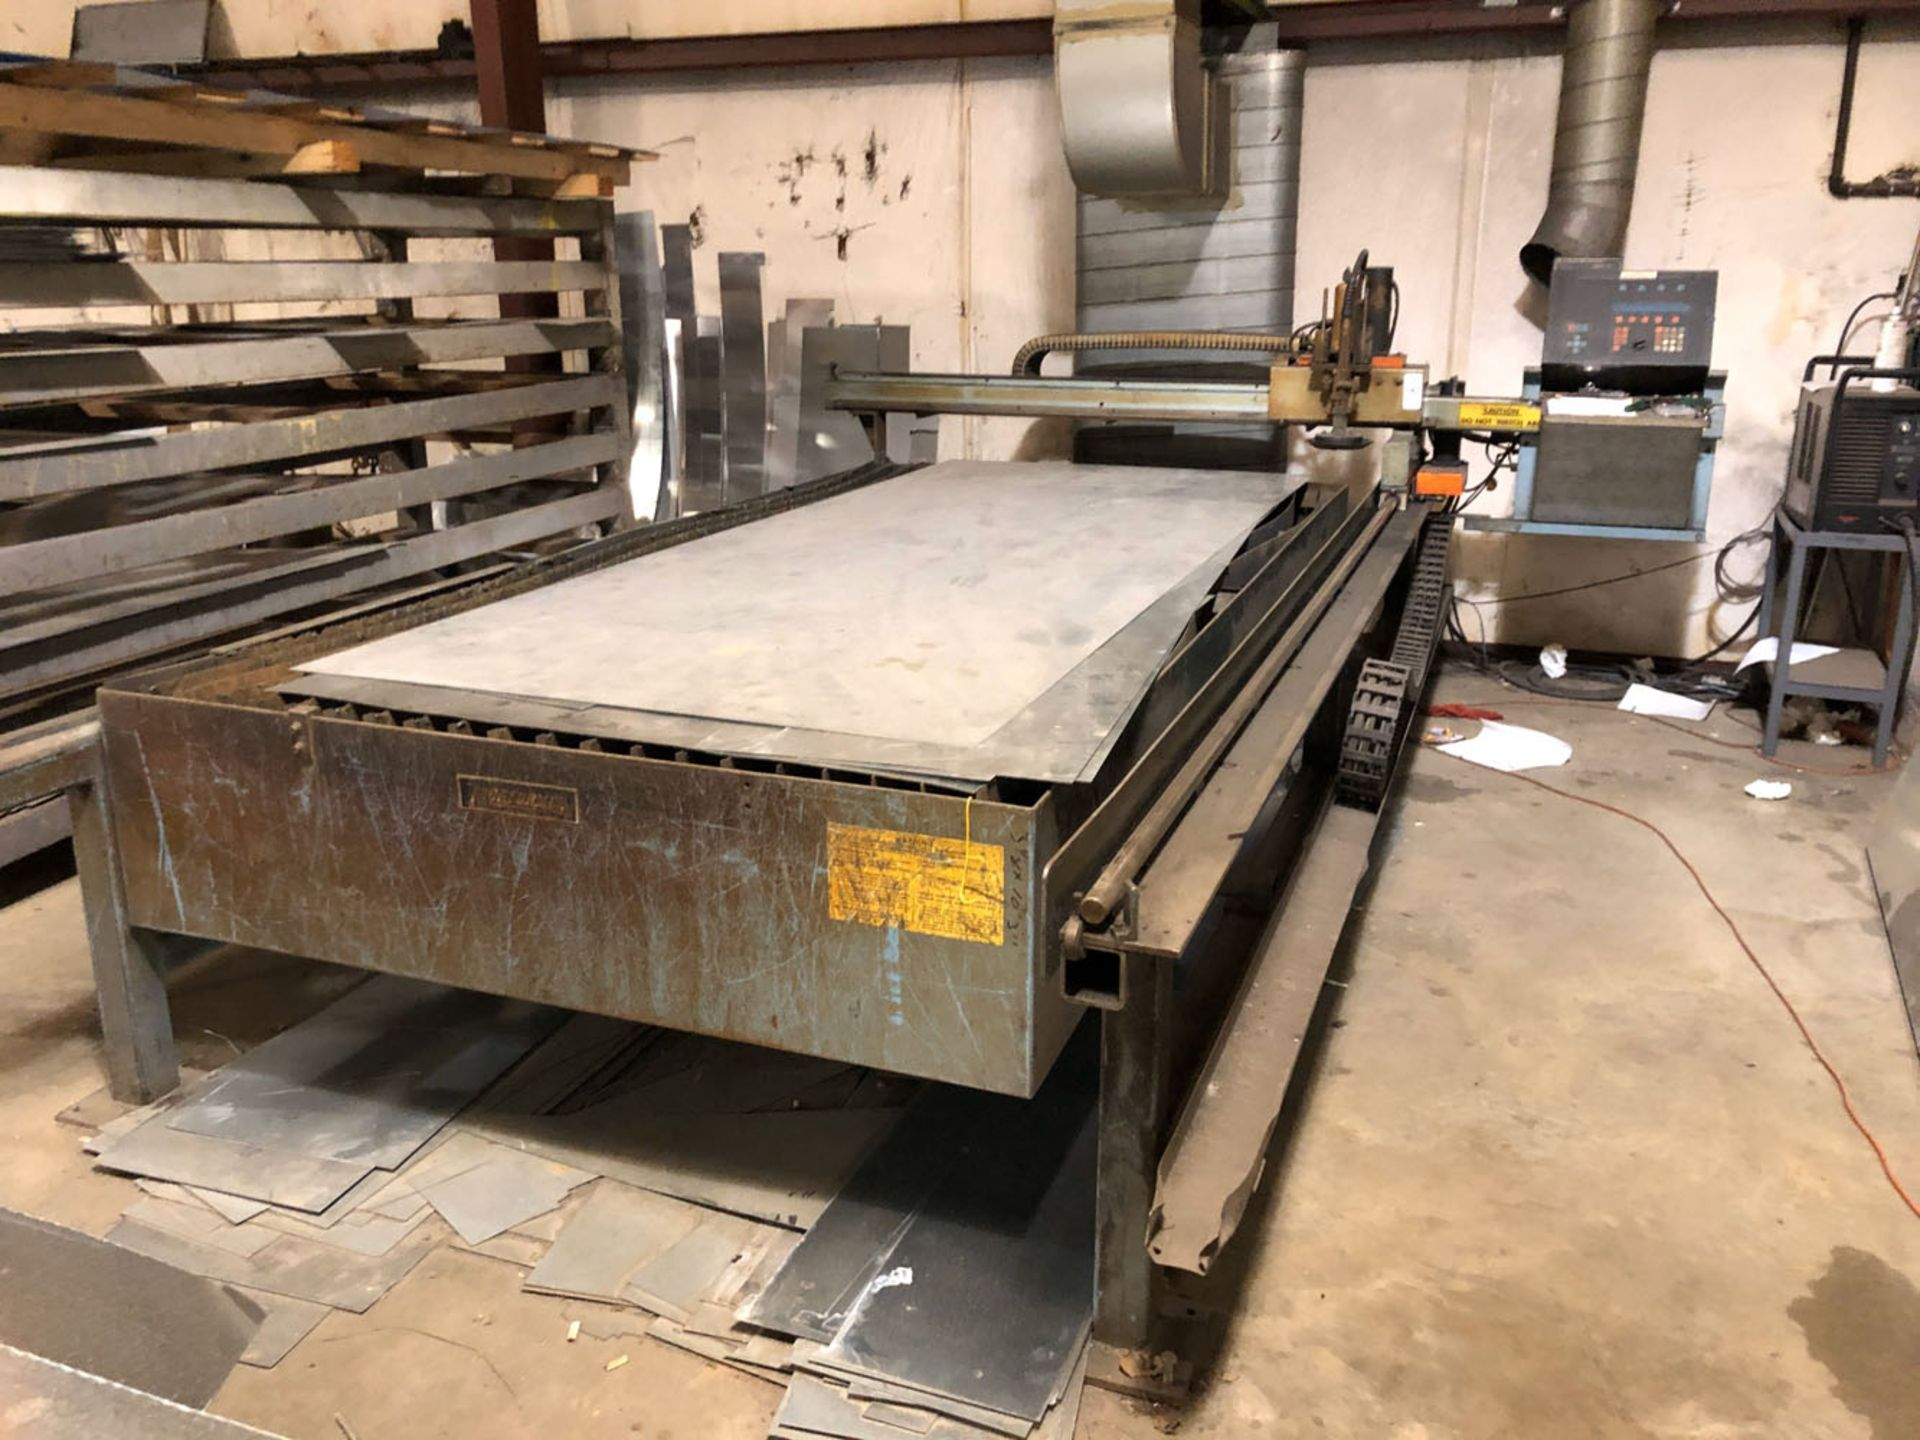 Lot 147 - CNC Plasma Cutter